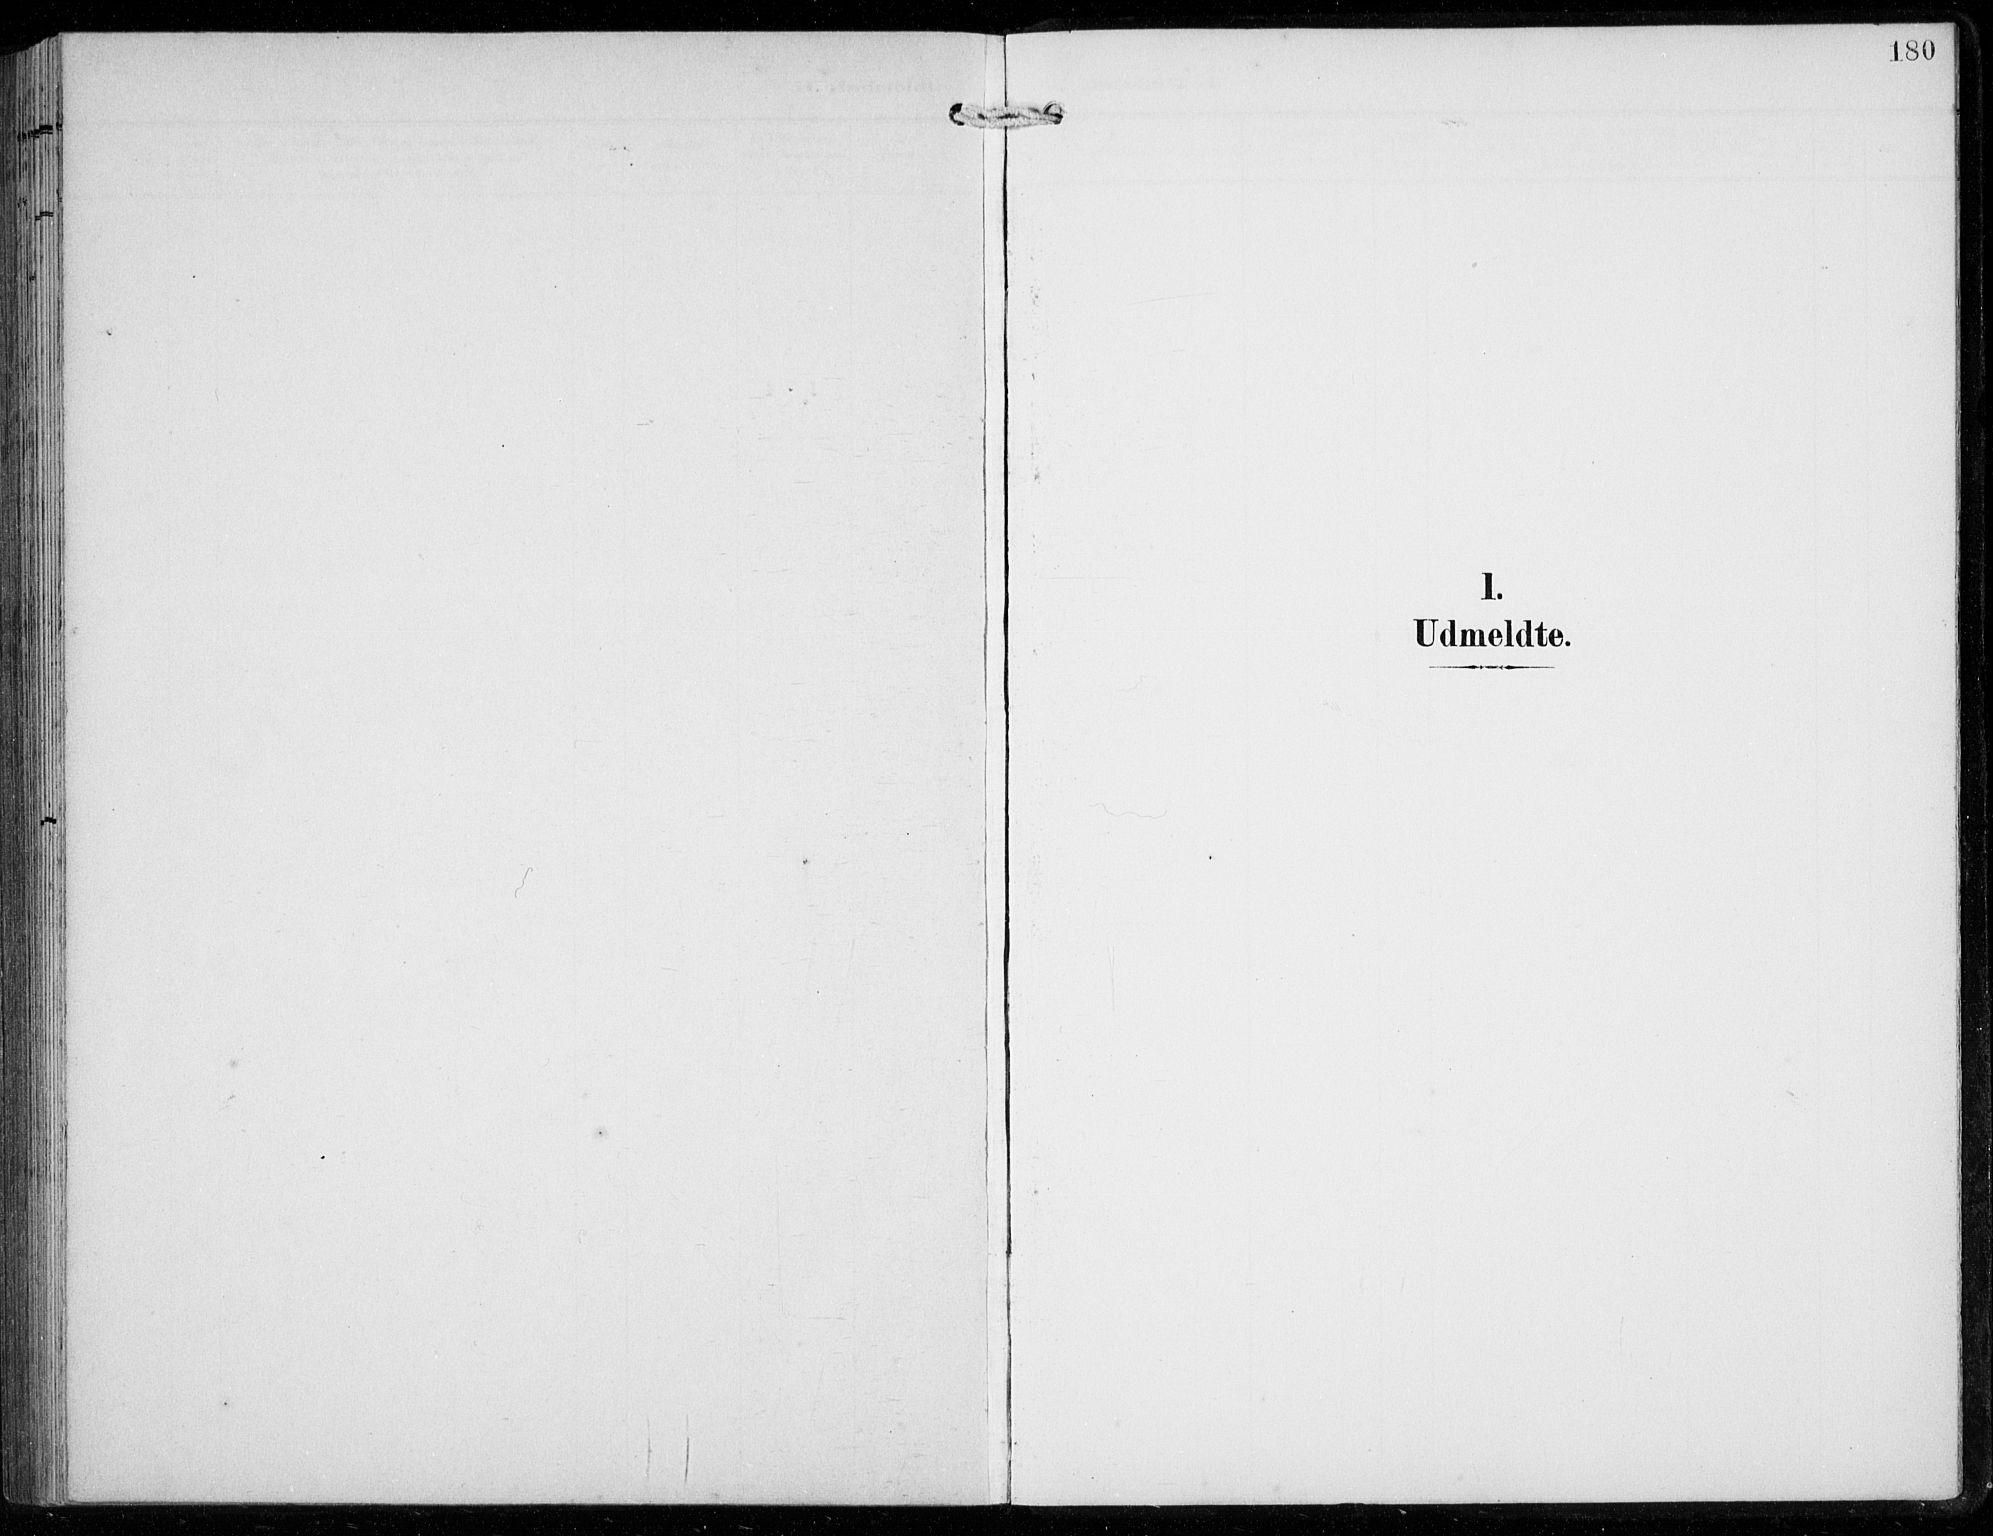 SAB, Ullensvang Sokneprestembete, H/Hab: Parish register (copy) no. F  1, 1902-1935, p. 180